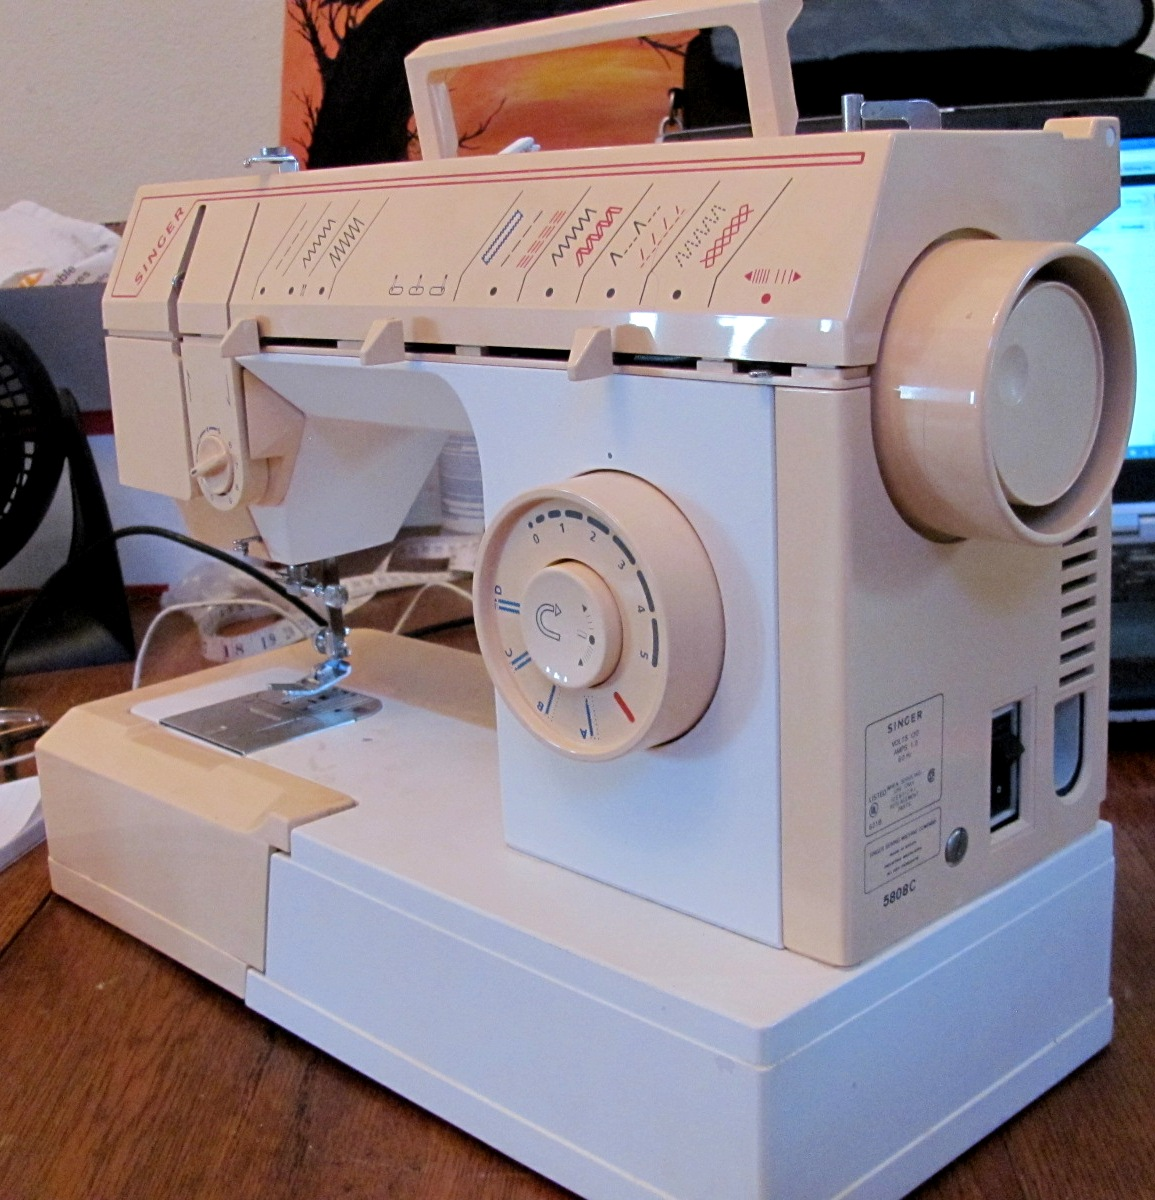 the sewing machine rescue singer 5808c rh sewingmachinerescue blogspot com singer model 5808c manual singer 5808c manual español